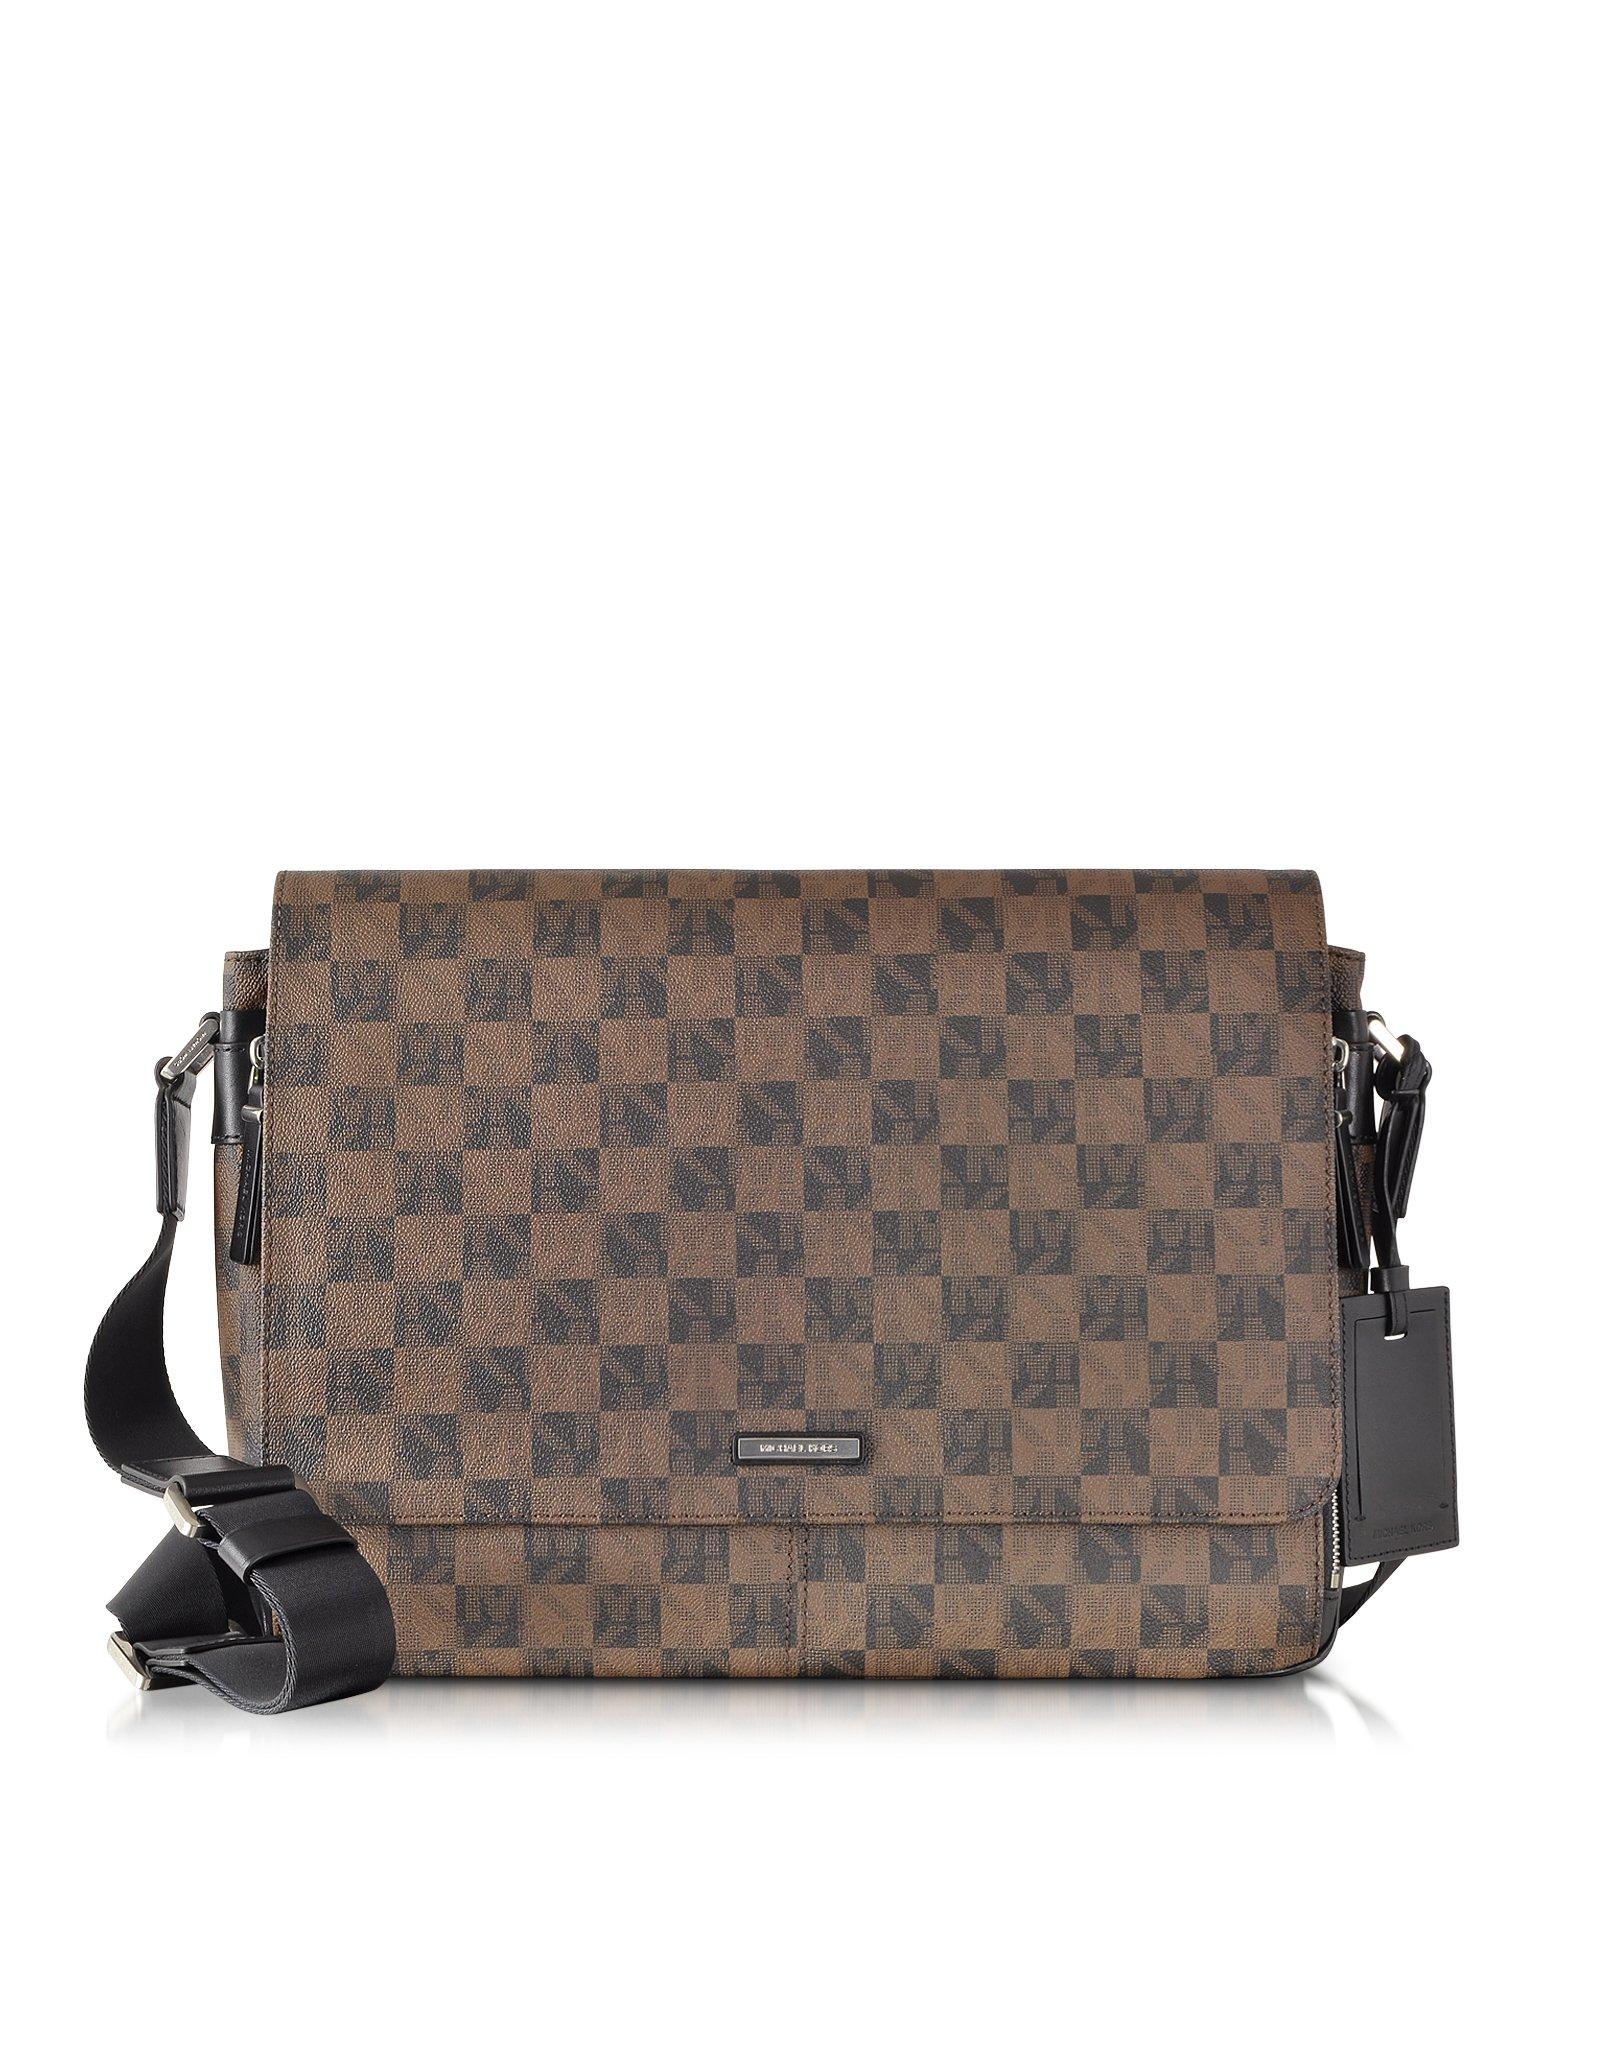 e9339d01b7aa Michael Kors Jet Set Mens Logo Large Eco Leather Messenger Bag in ...